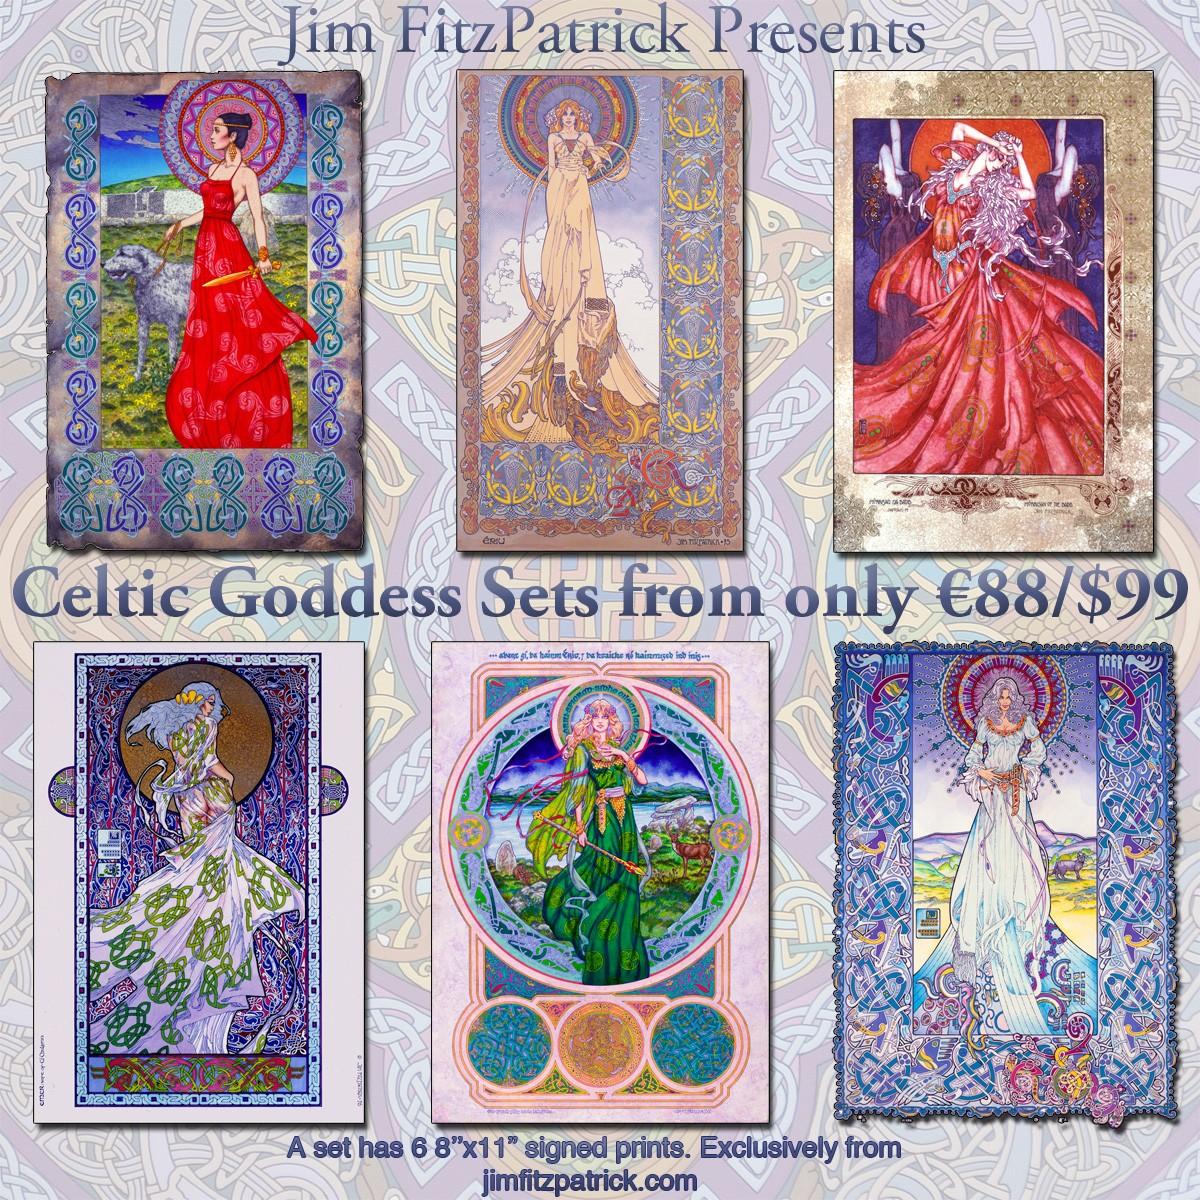 Prints, Irish, Ireland, Myth, IrishArt, CelticArt, Celtic, Mythology, Art, CelticMythology, JimFitzPatrick, theBookofConquests, women, erotic, erotica, Goddessess, Celtic gods,